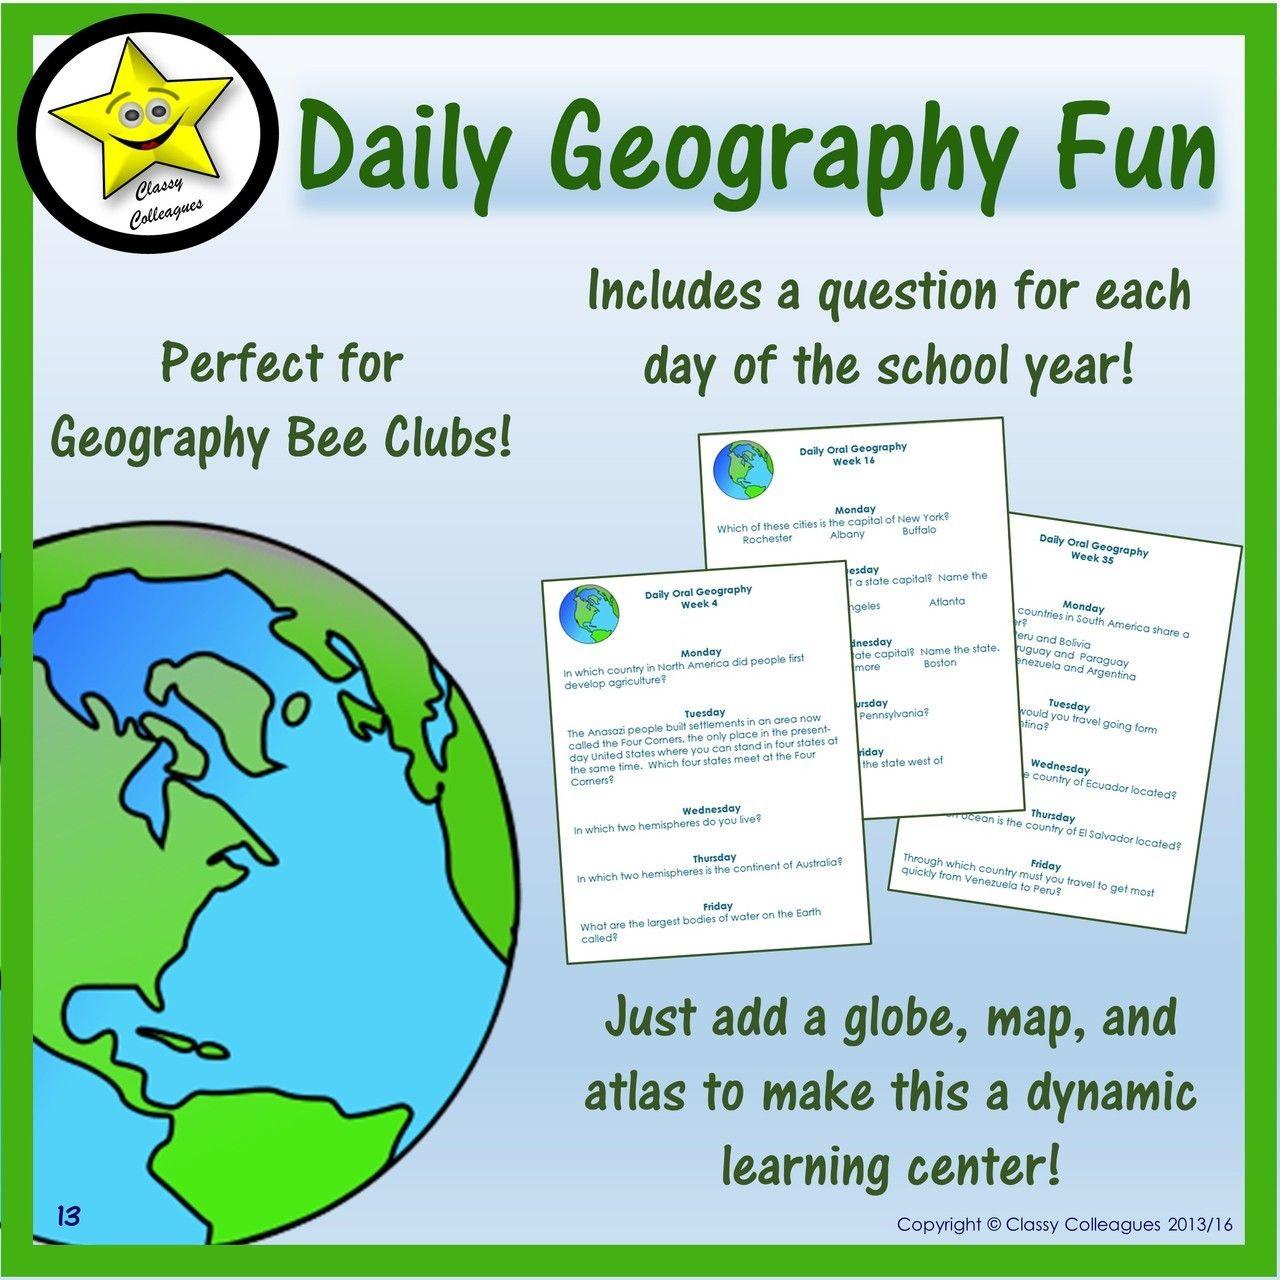 Daily Geography Fun